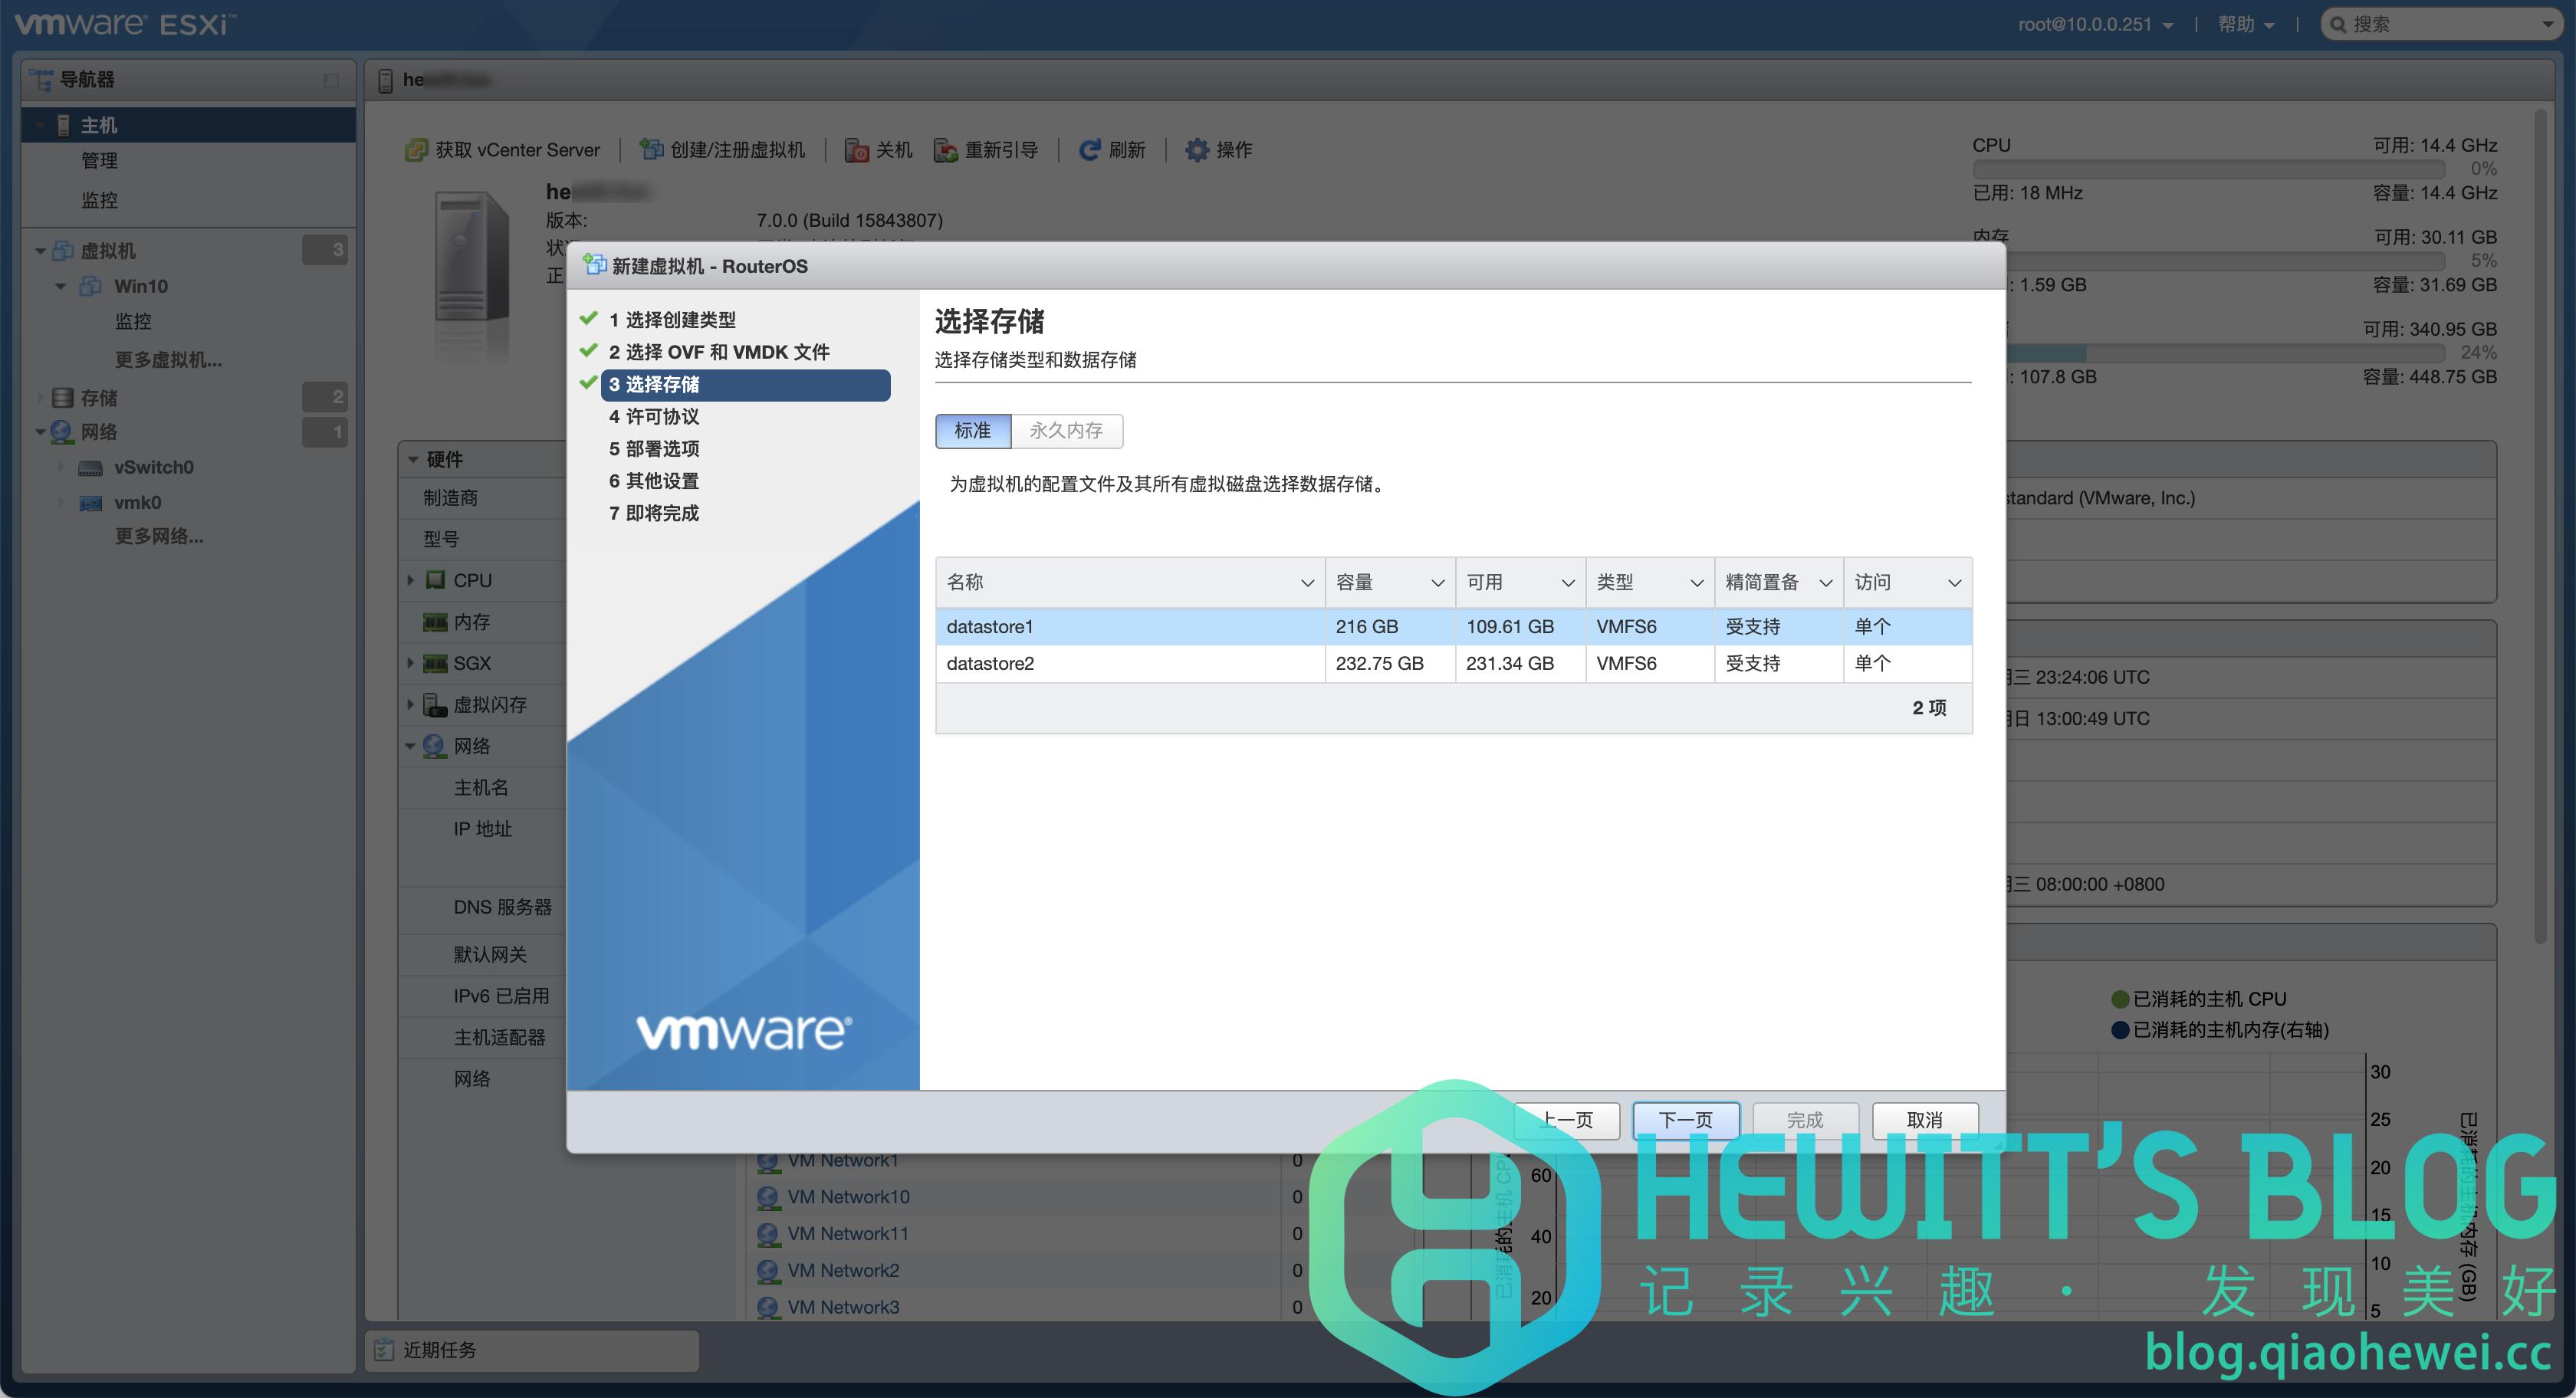 ESXI安装Mikrotik RouterOS(ROS)软路由部署指南(附授权镜像下载)插图17